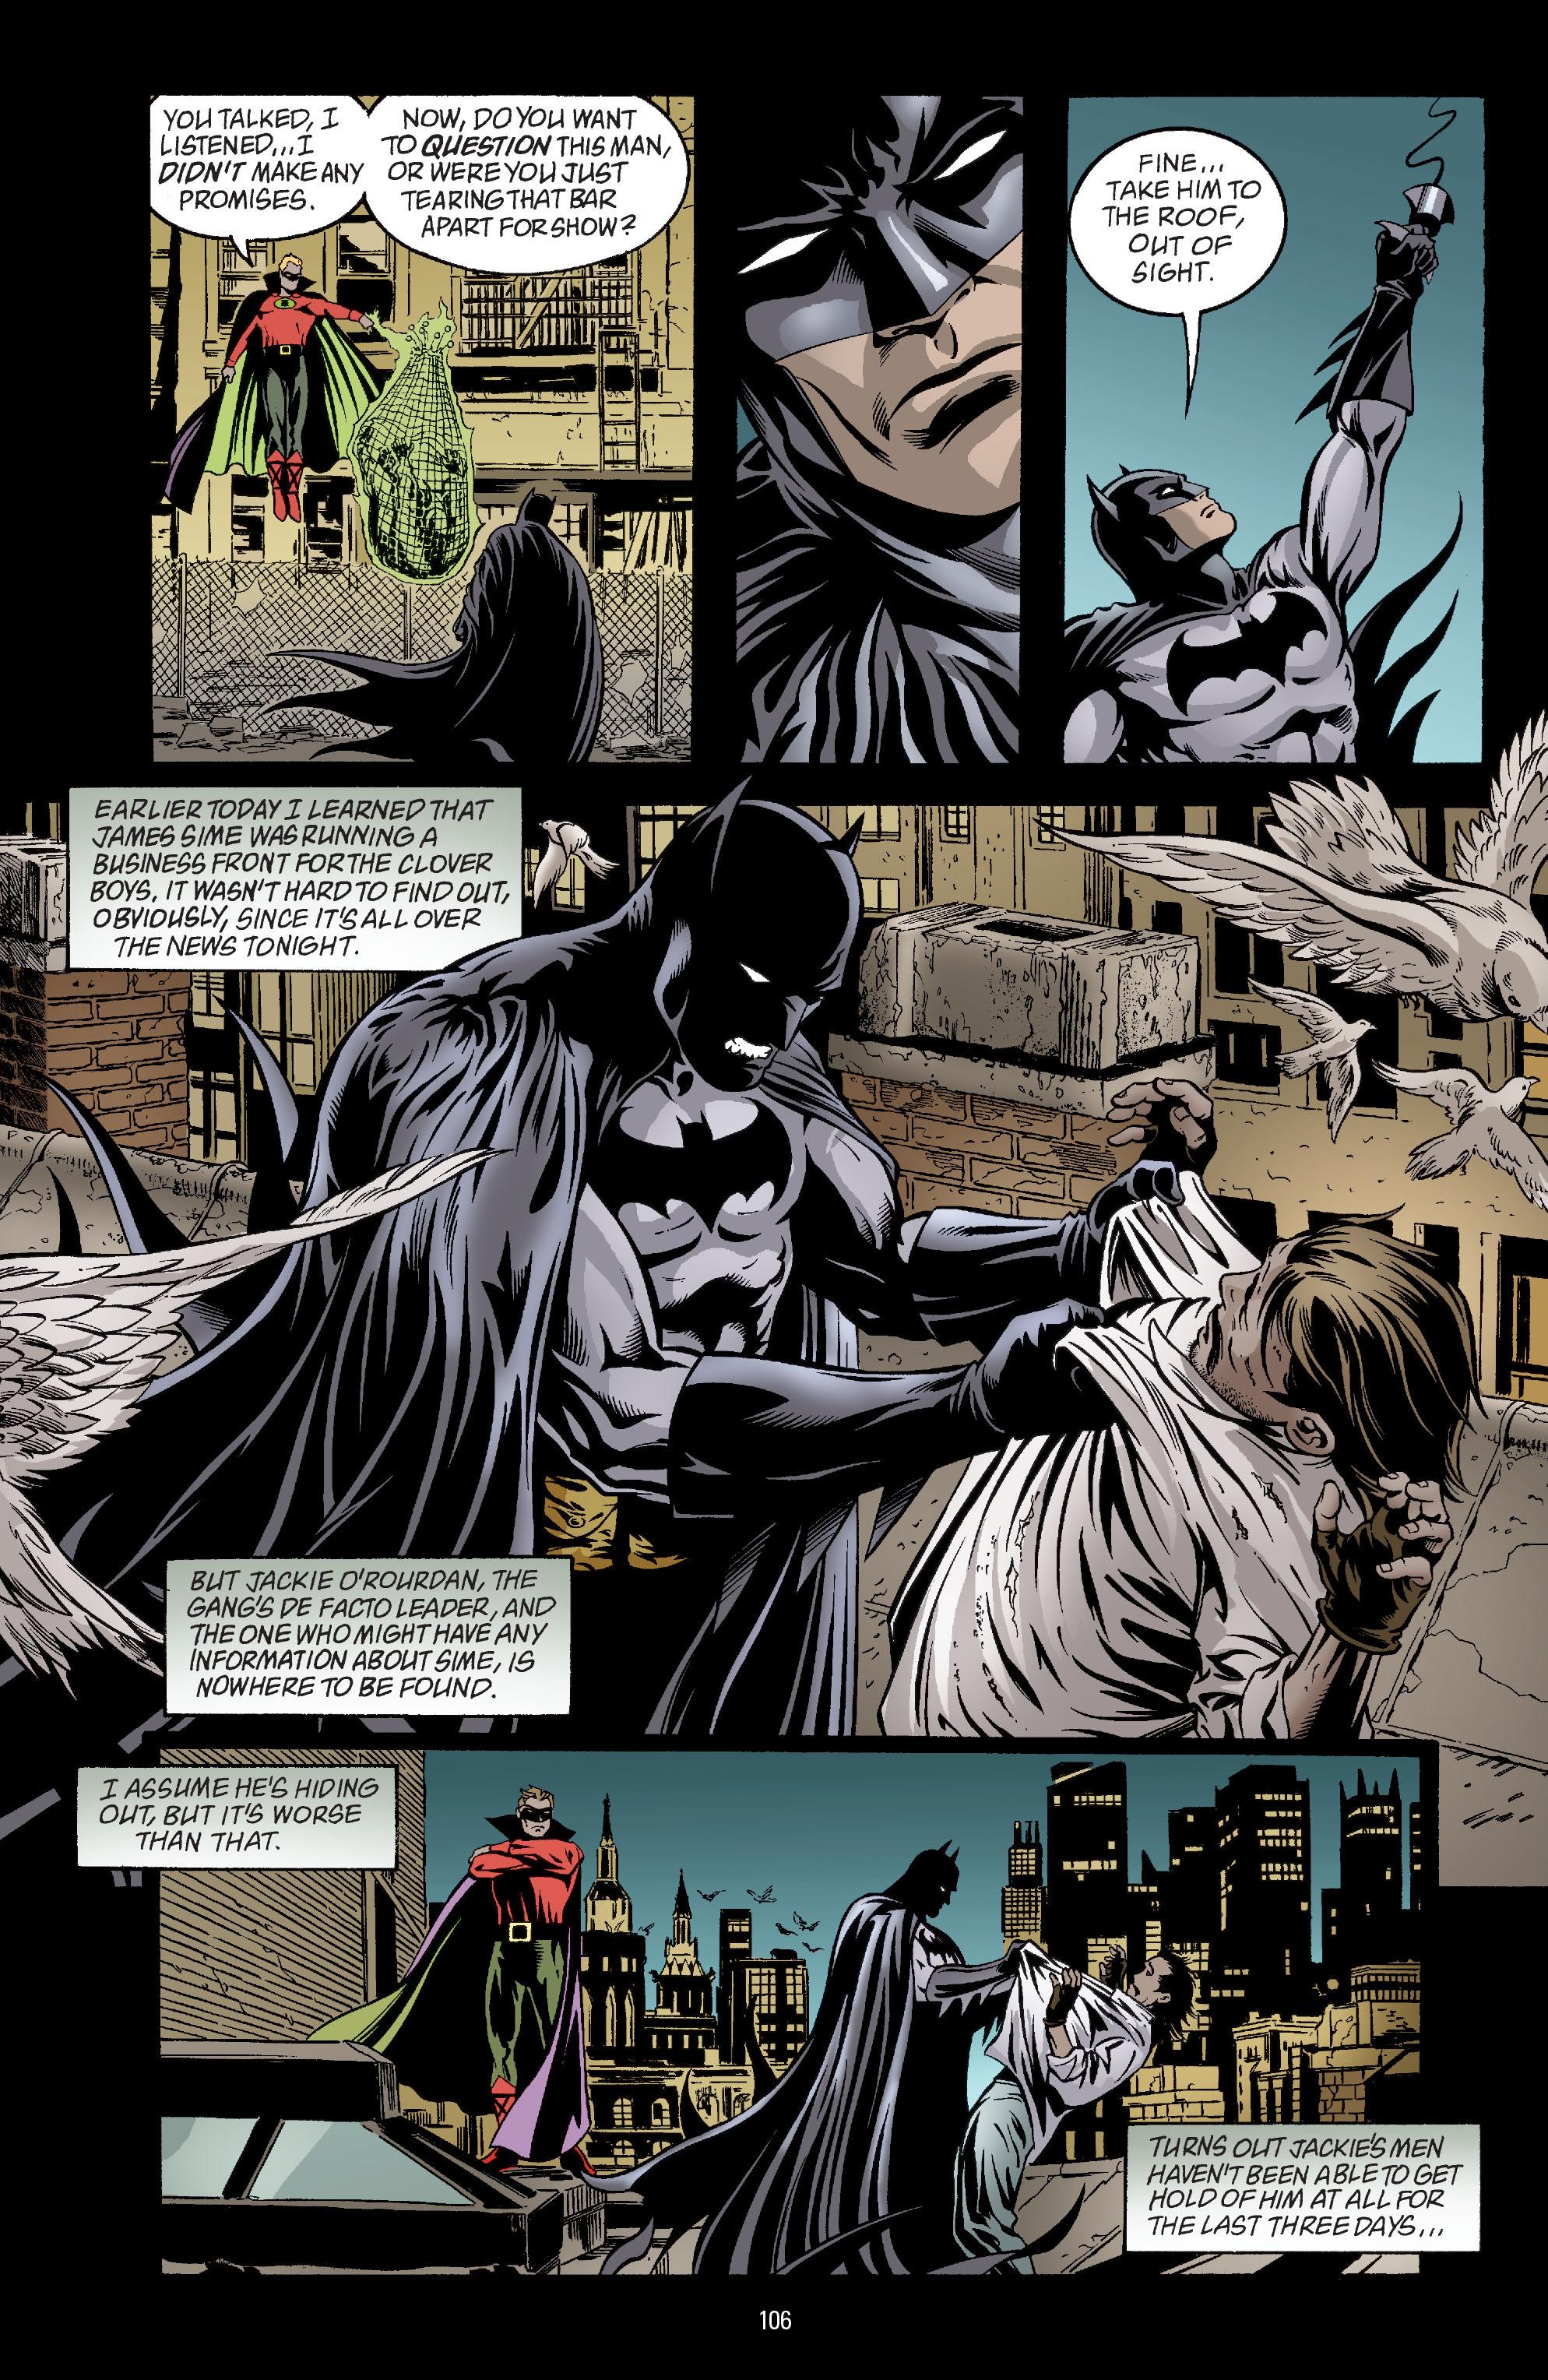 Batman: The Man Who Laughs chap 1 pic 107